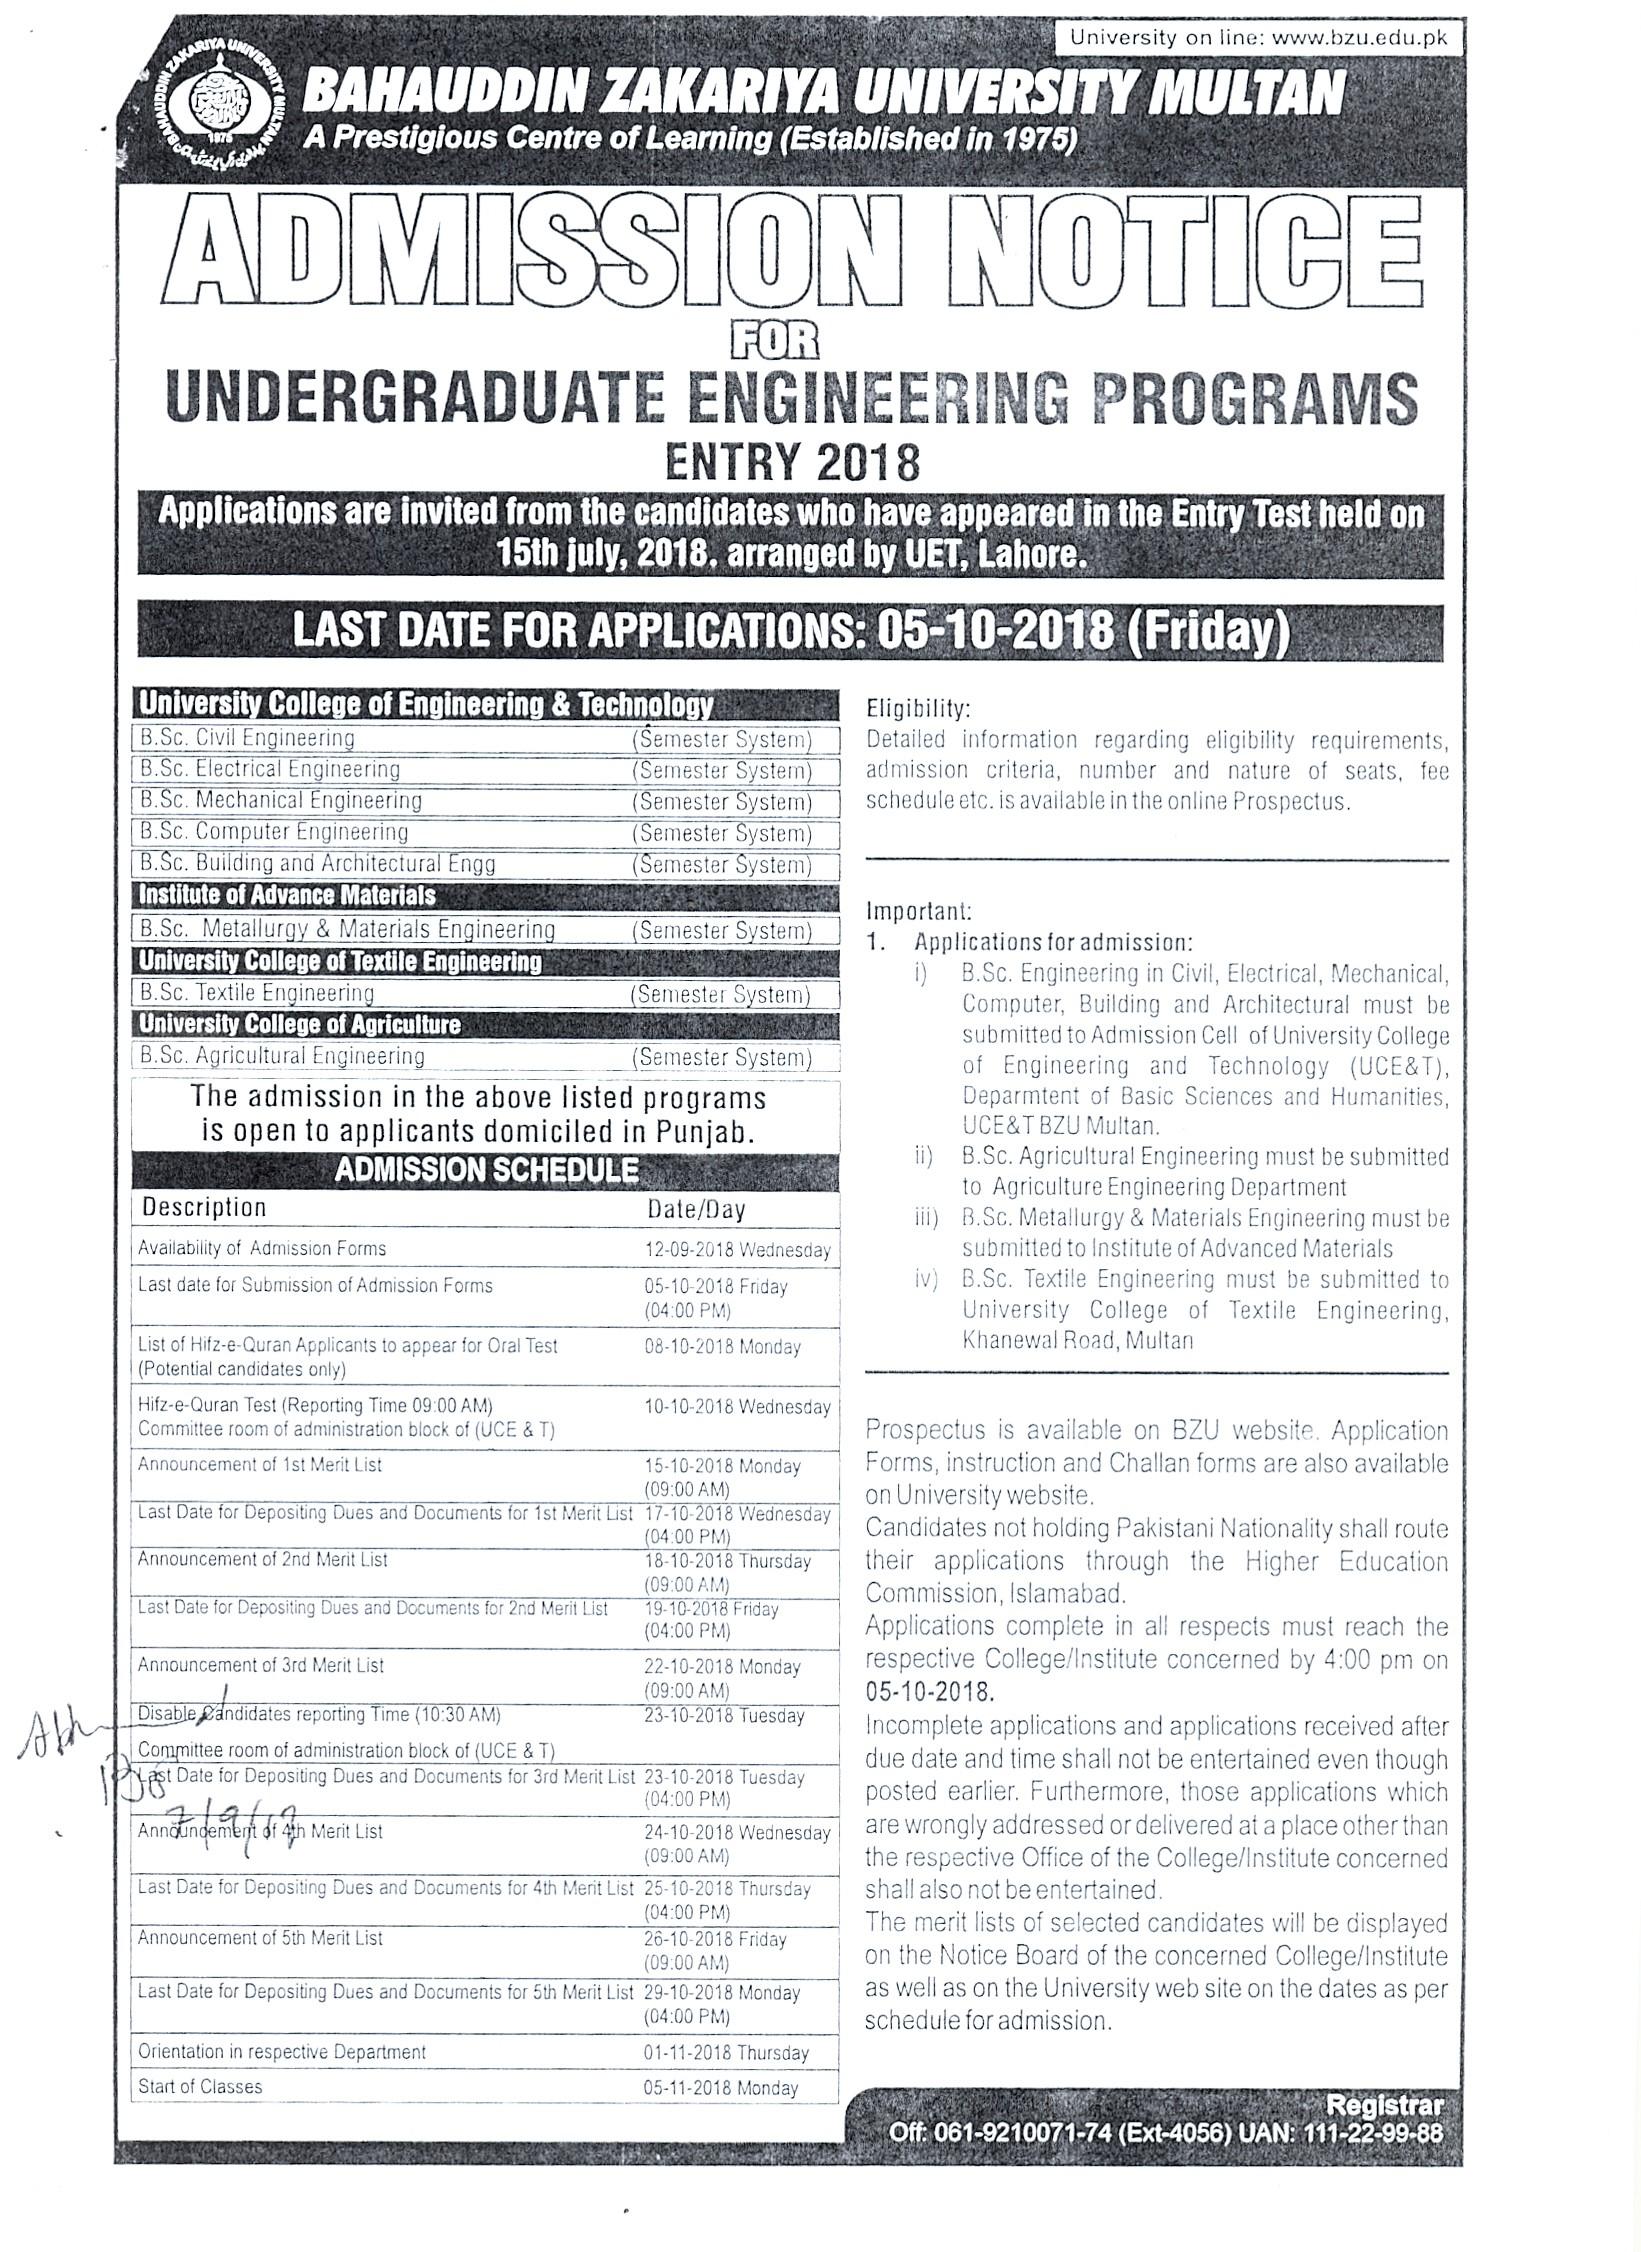 BZU Multan Undergraduate Engineering Admission 2018 Form